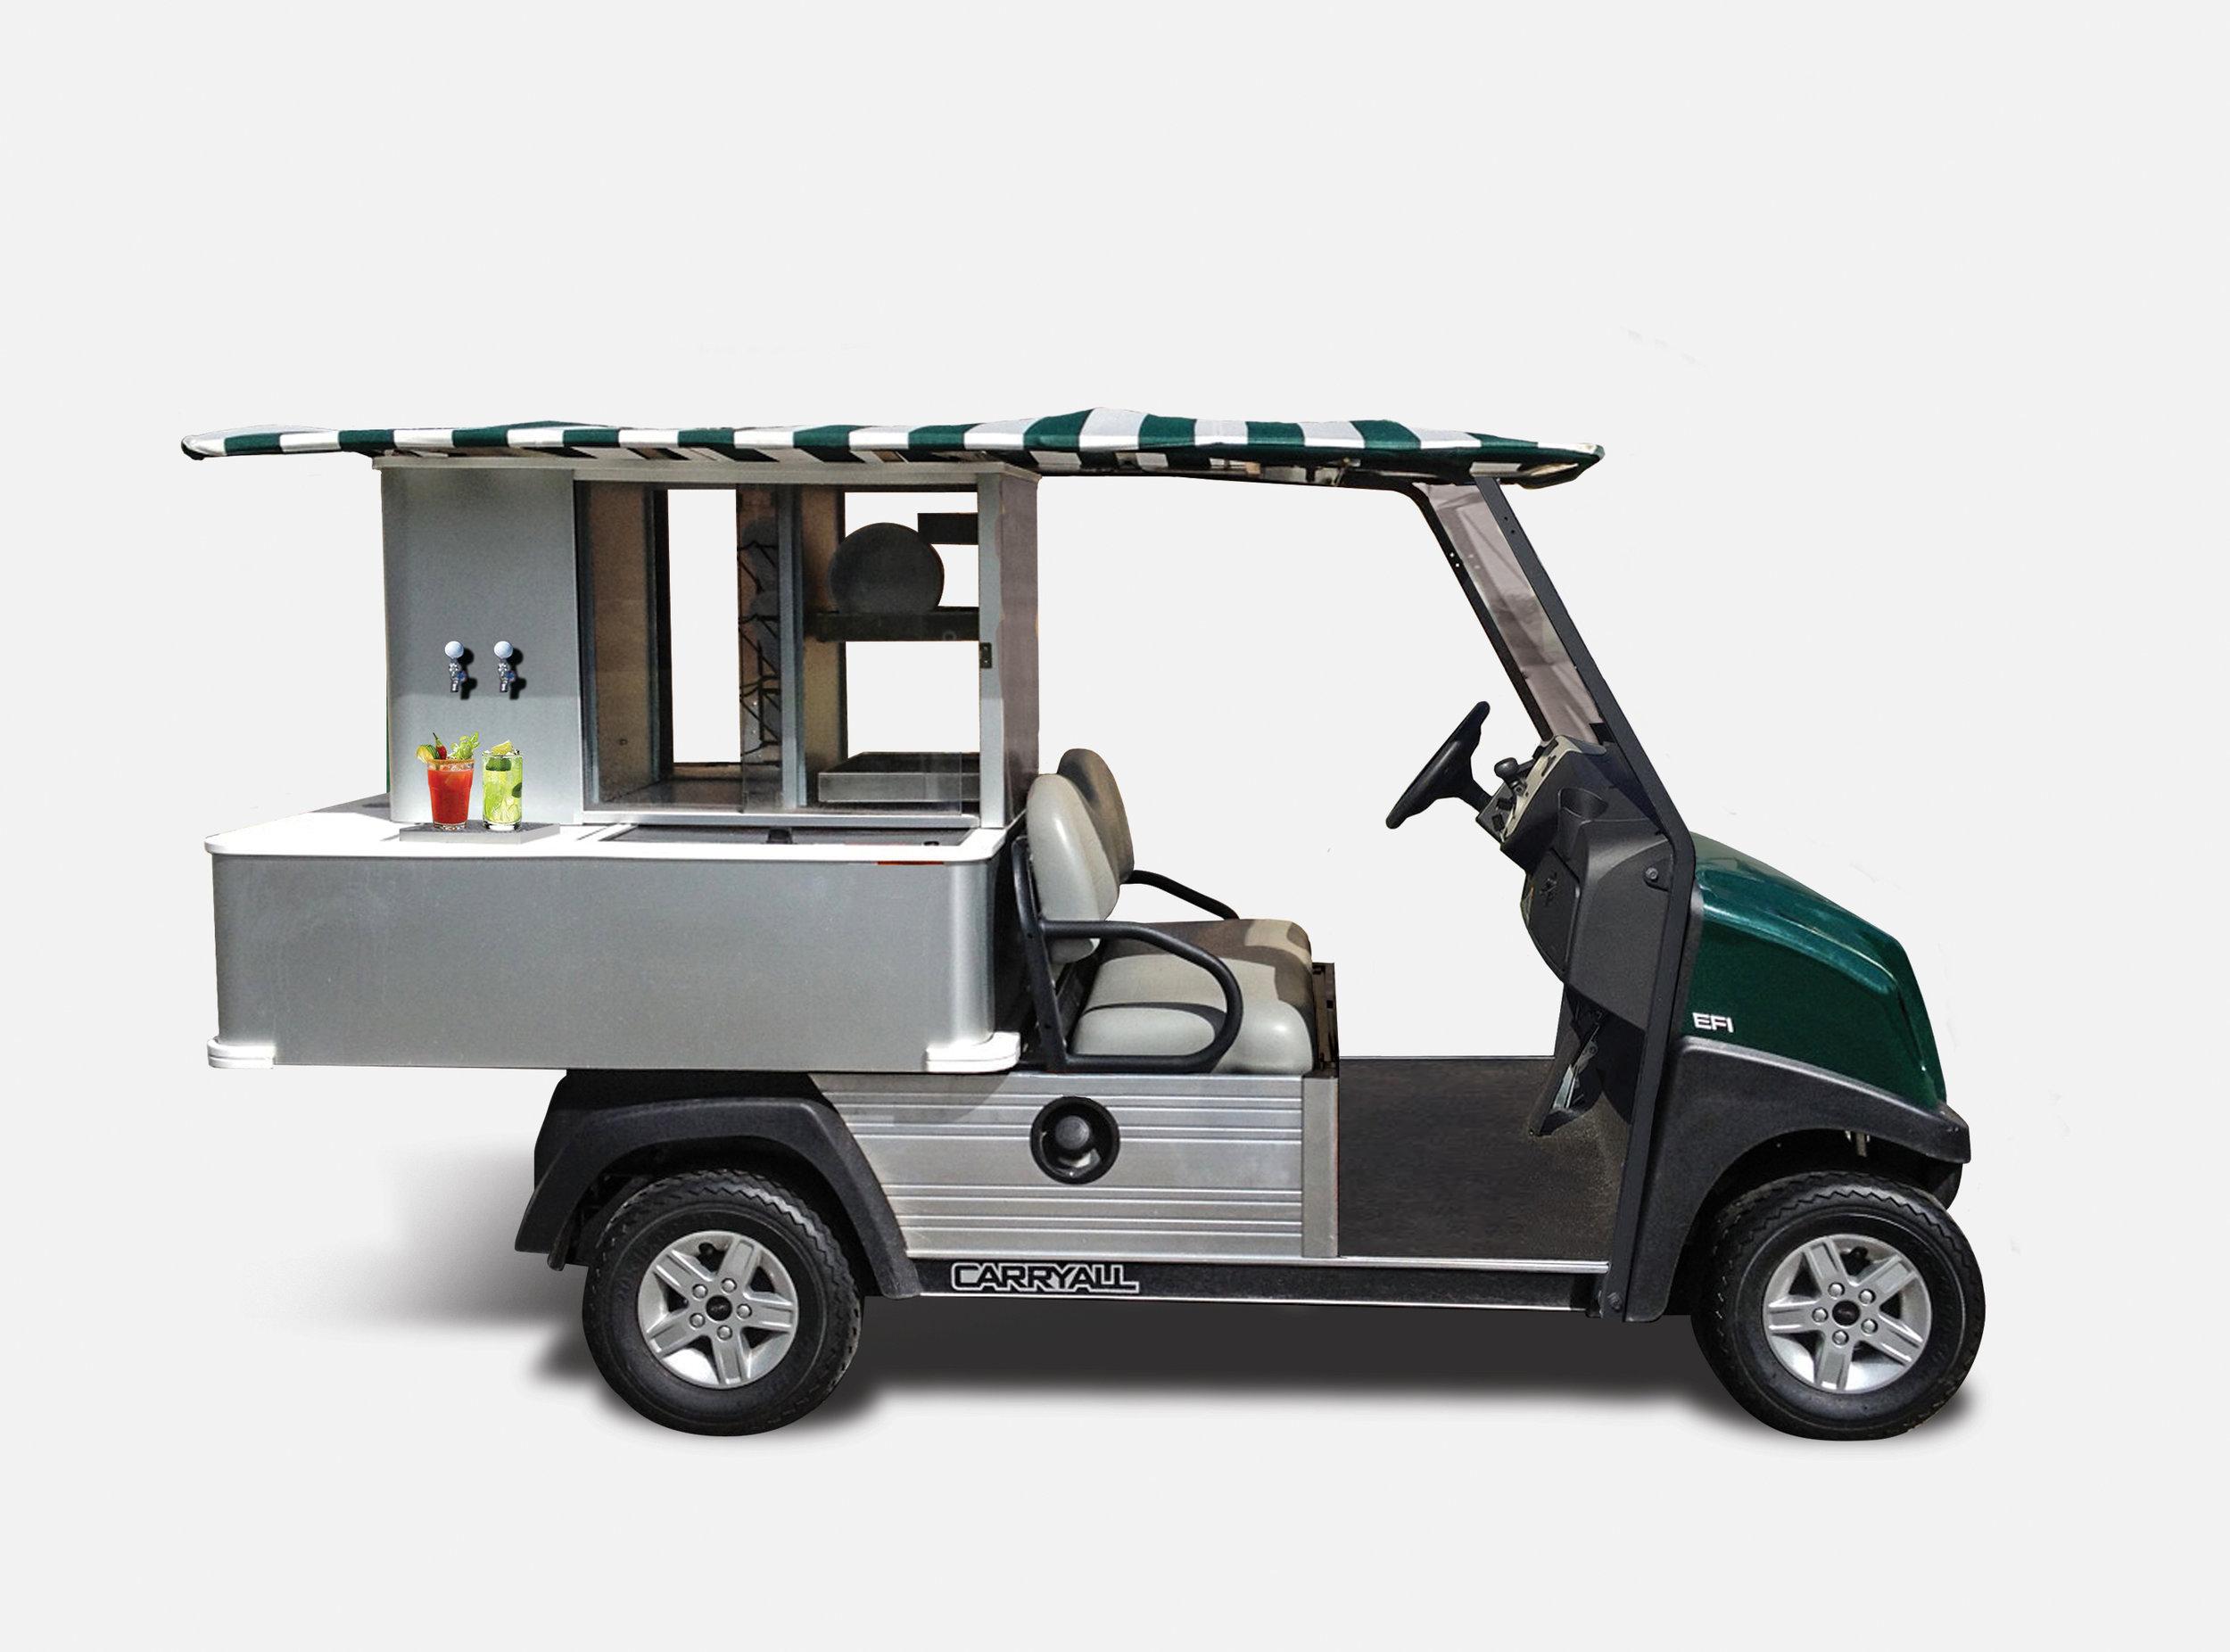 Golf-cart-on-course-+Tee-Box-3.jpg